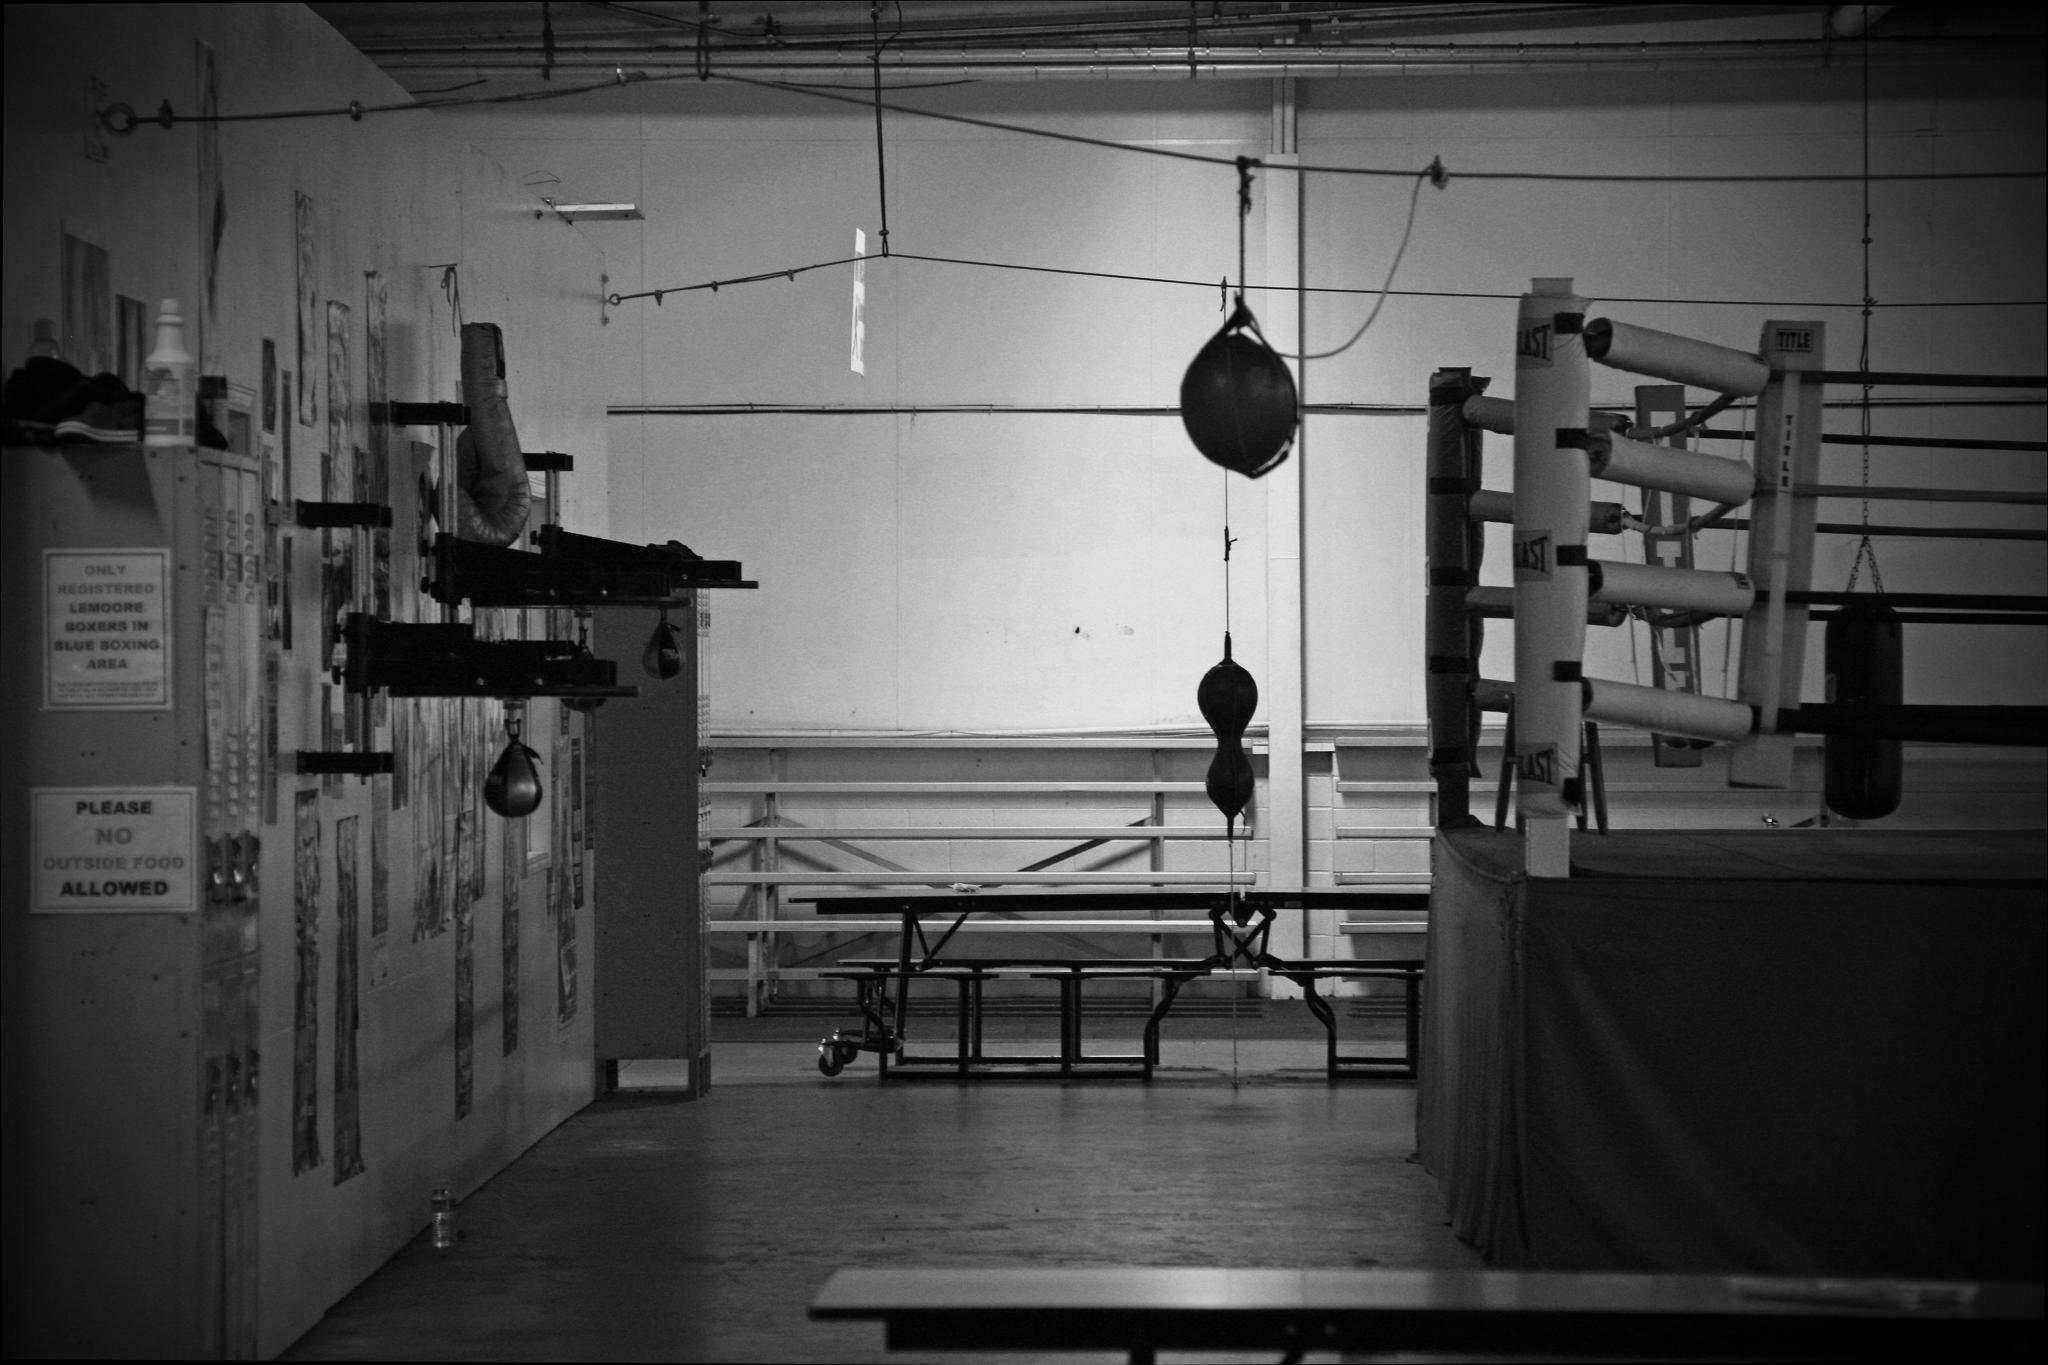 Empty Boxing Gym For - empty boxing gym. Empty Gym Wallpaper